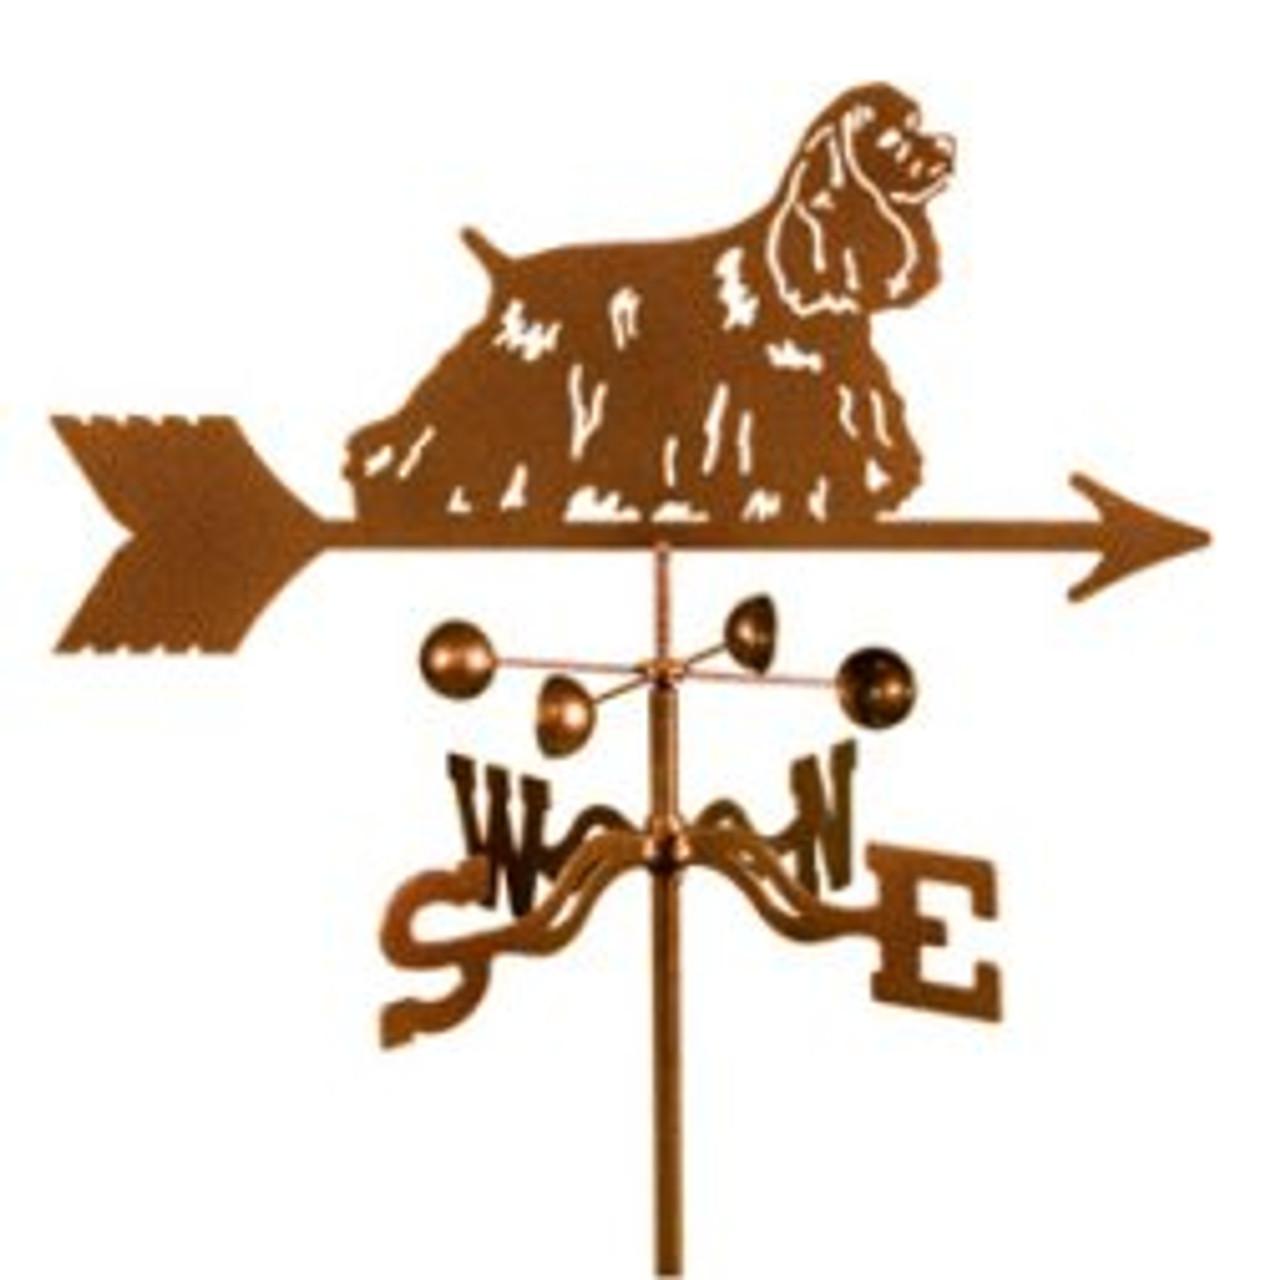 Dog-Cocker Spaniel Weathervane with mount